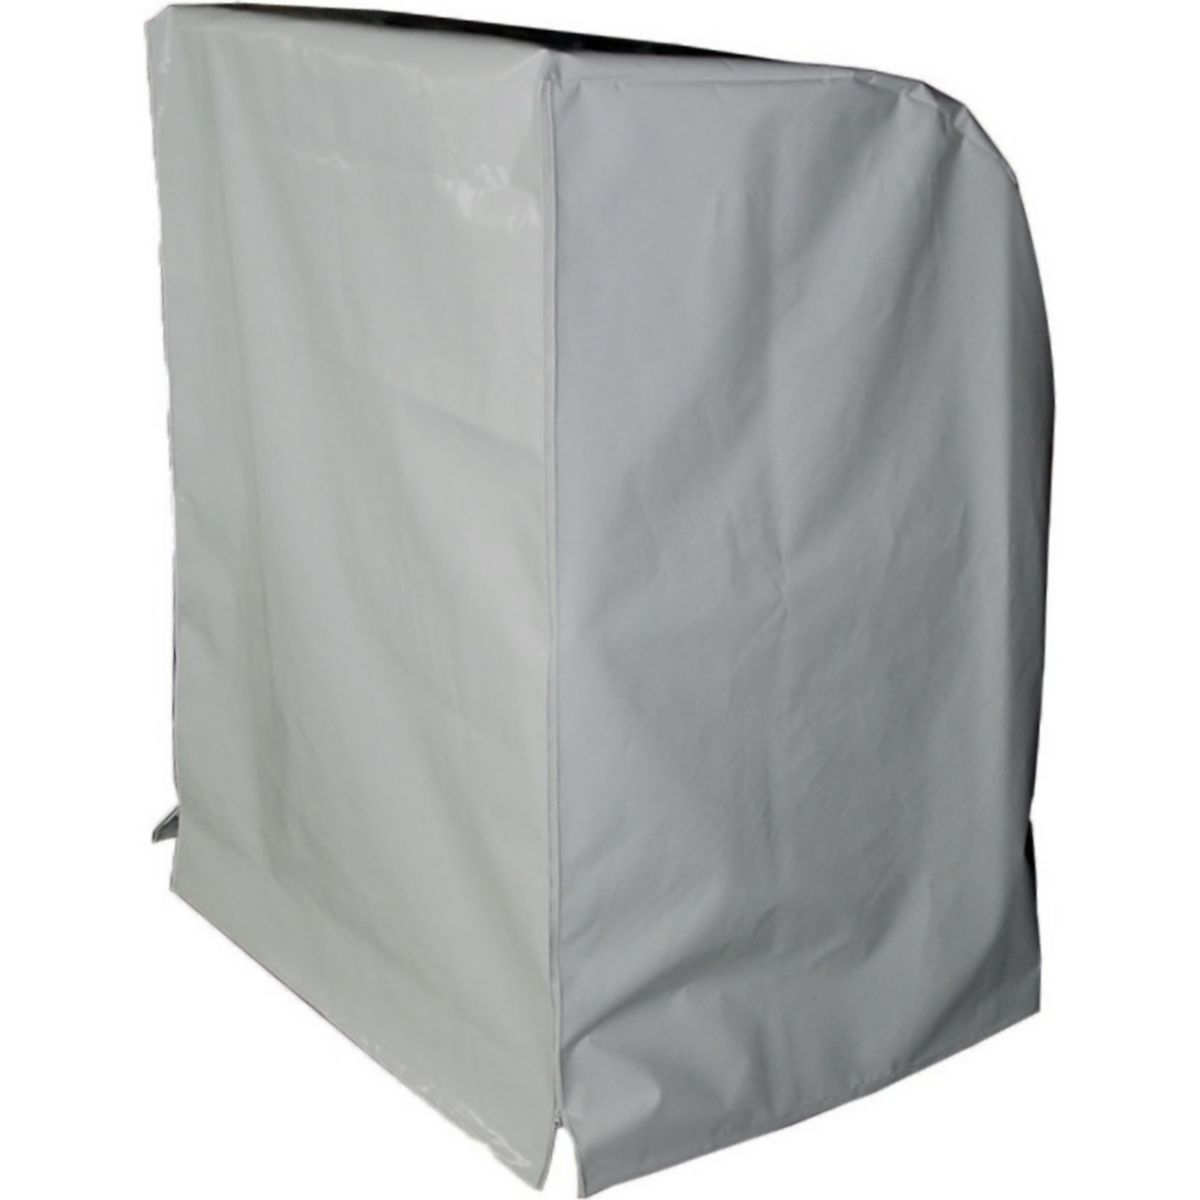 Strandkorbhülle XL Spezial - Grau jetztbilligerkaufen